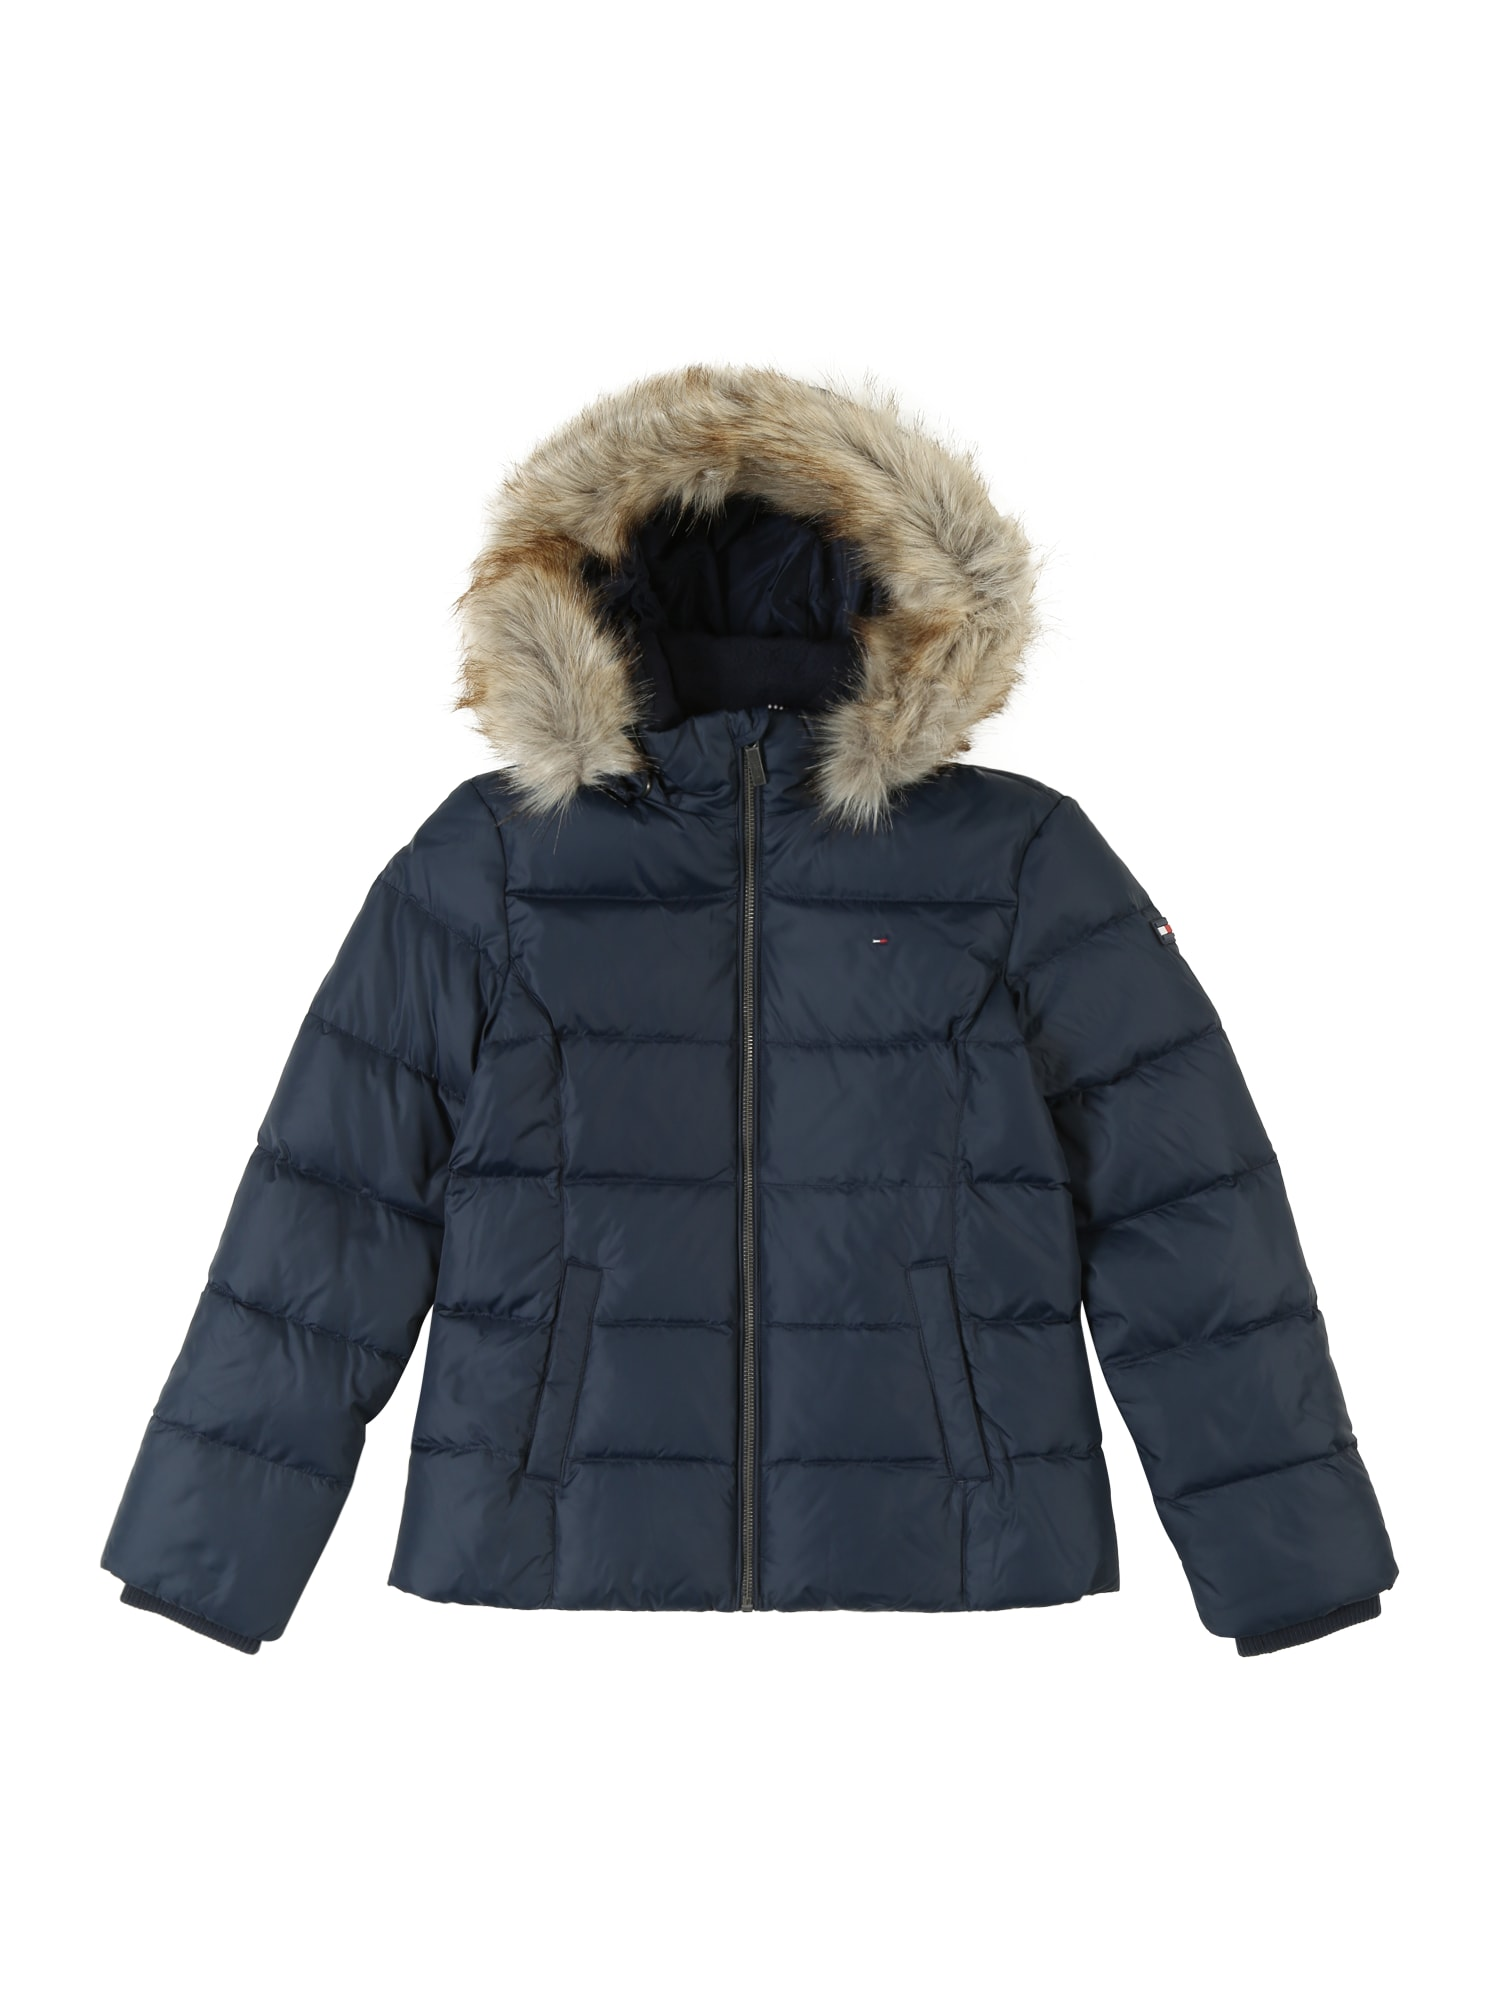 Přechodná bunda ESSENTIAL BASIC tmavě modrá TOMMY HILFIGER